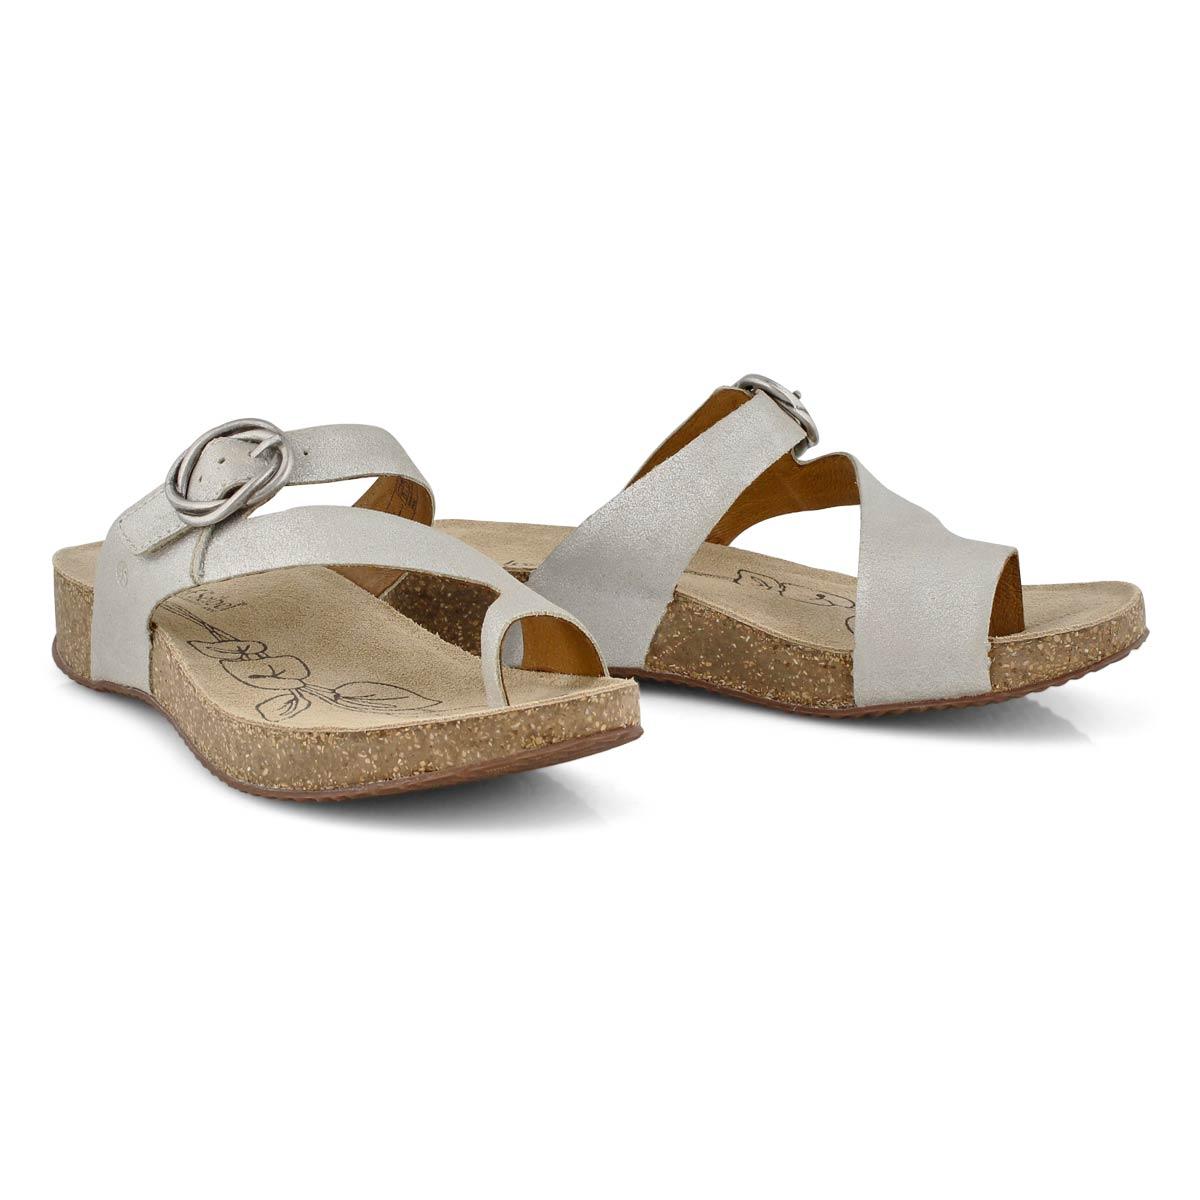 Lds Tonga 52 natrl thong footbed sandal